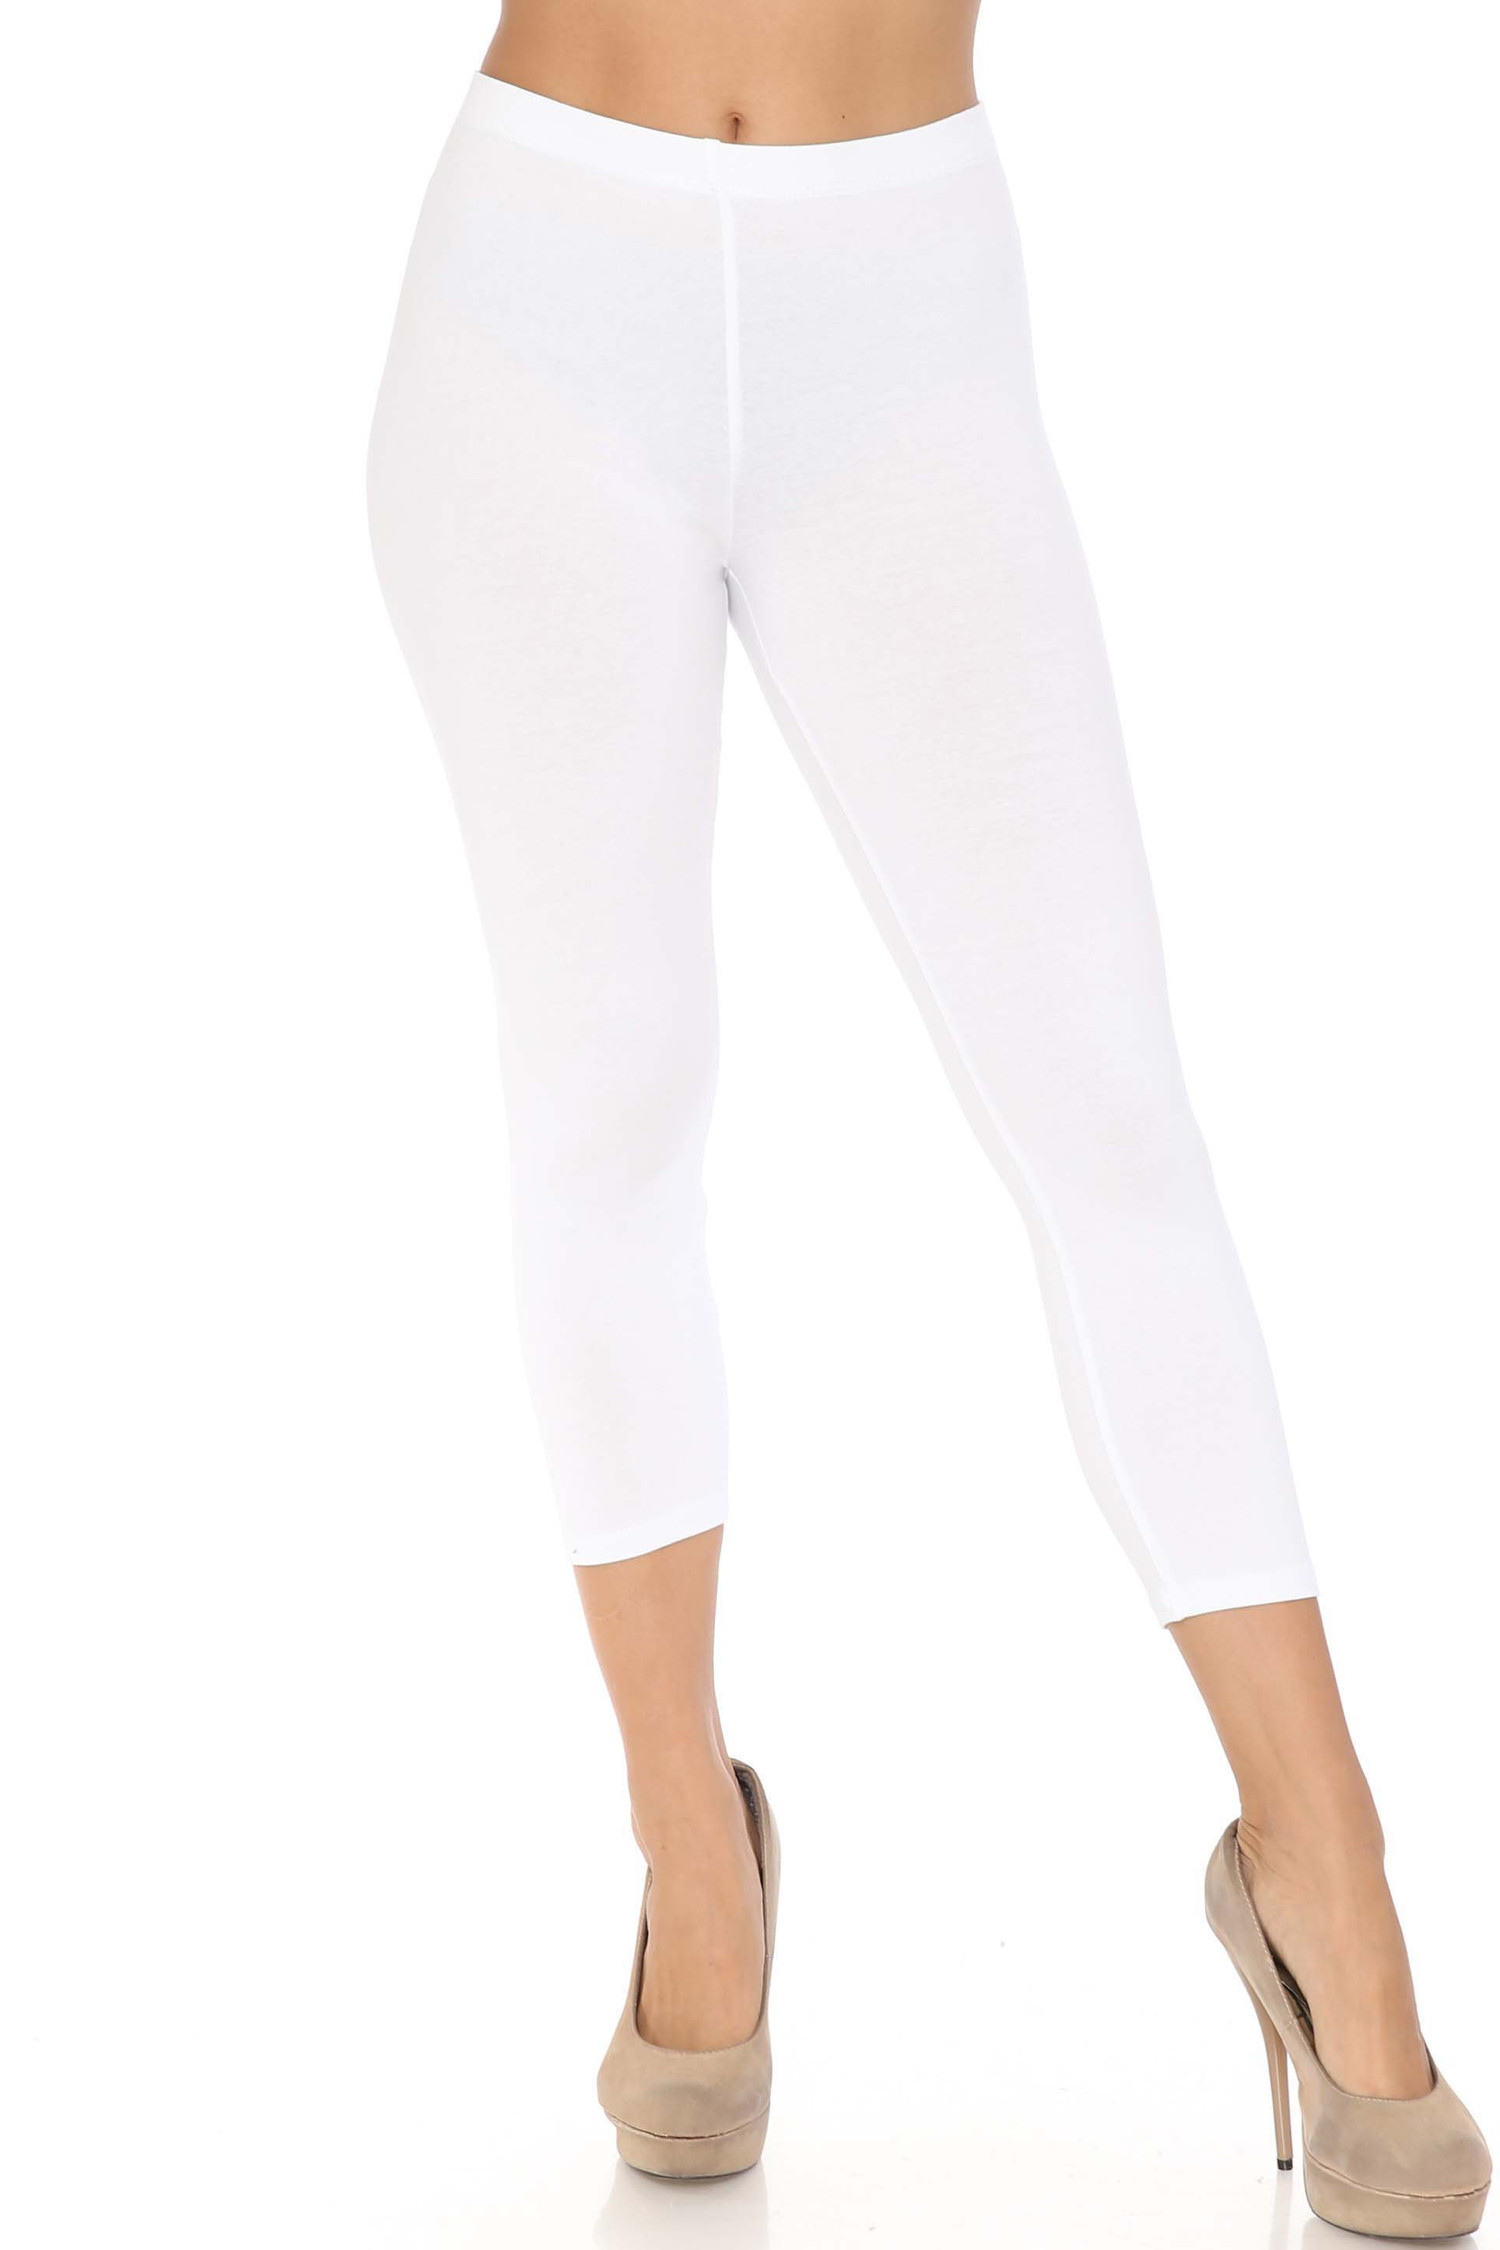 Front view of white USA Cotton Capri Length Leggings